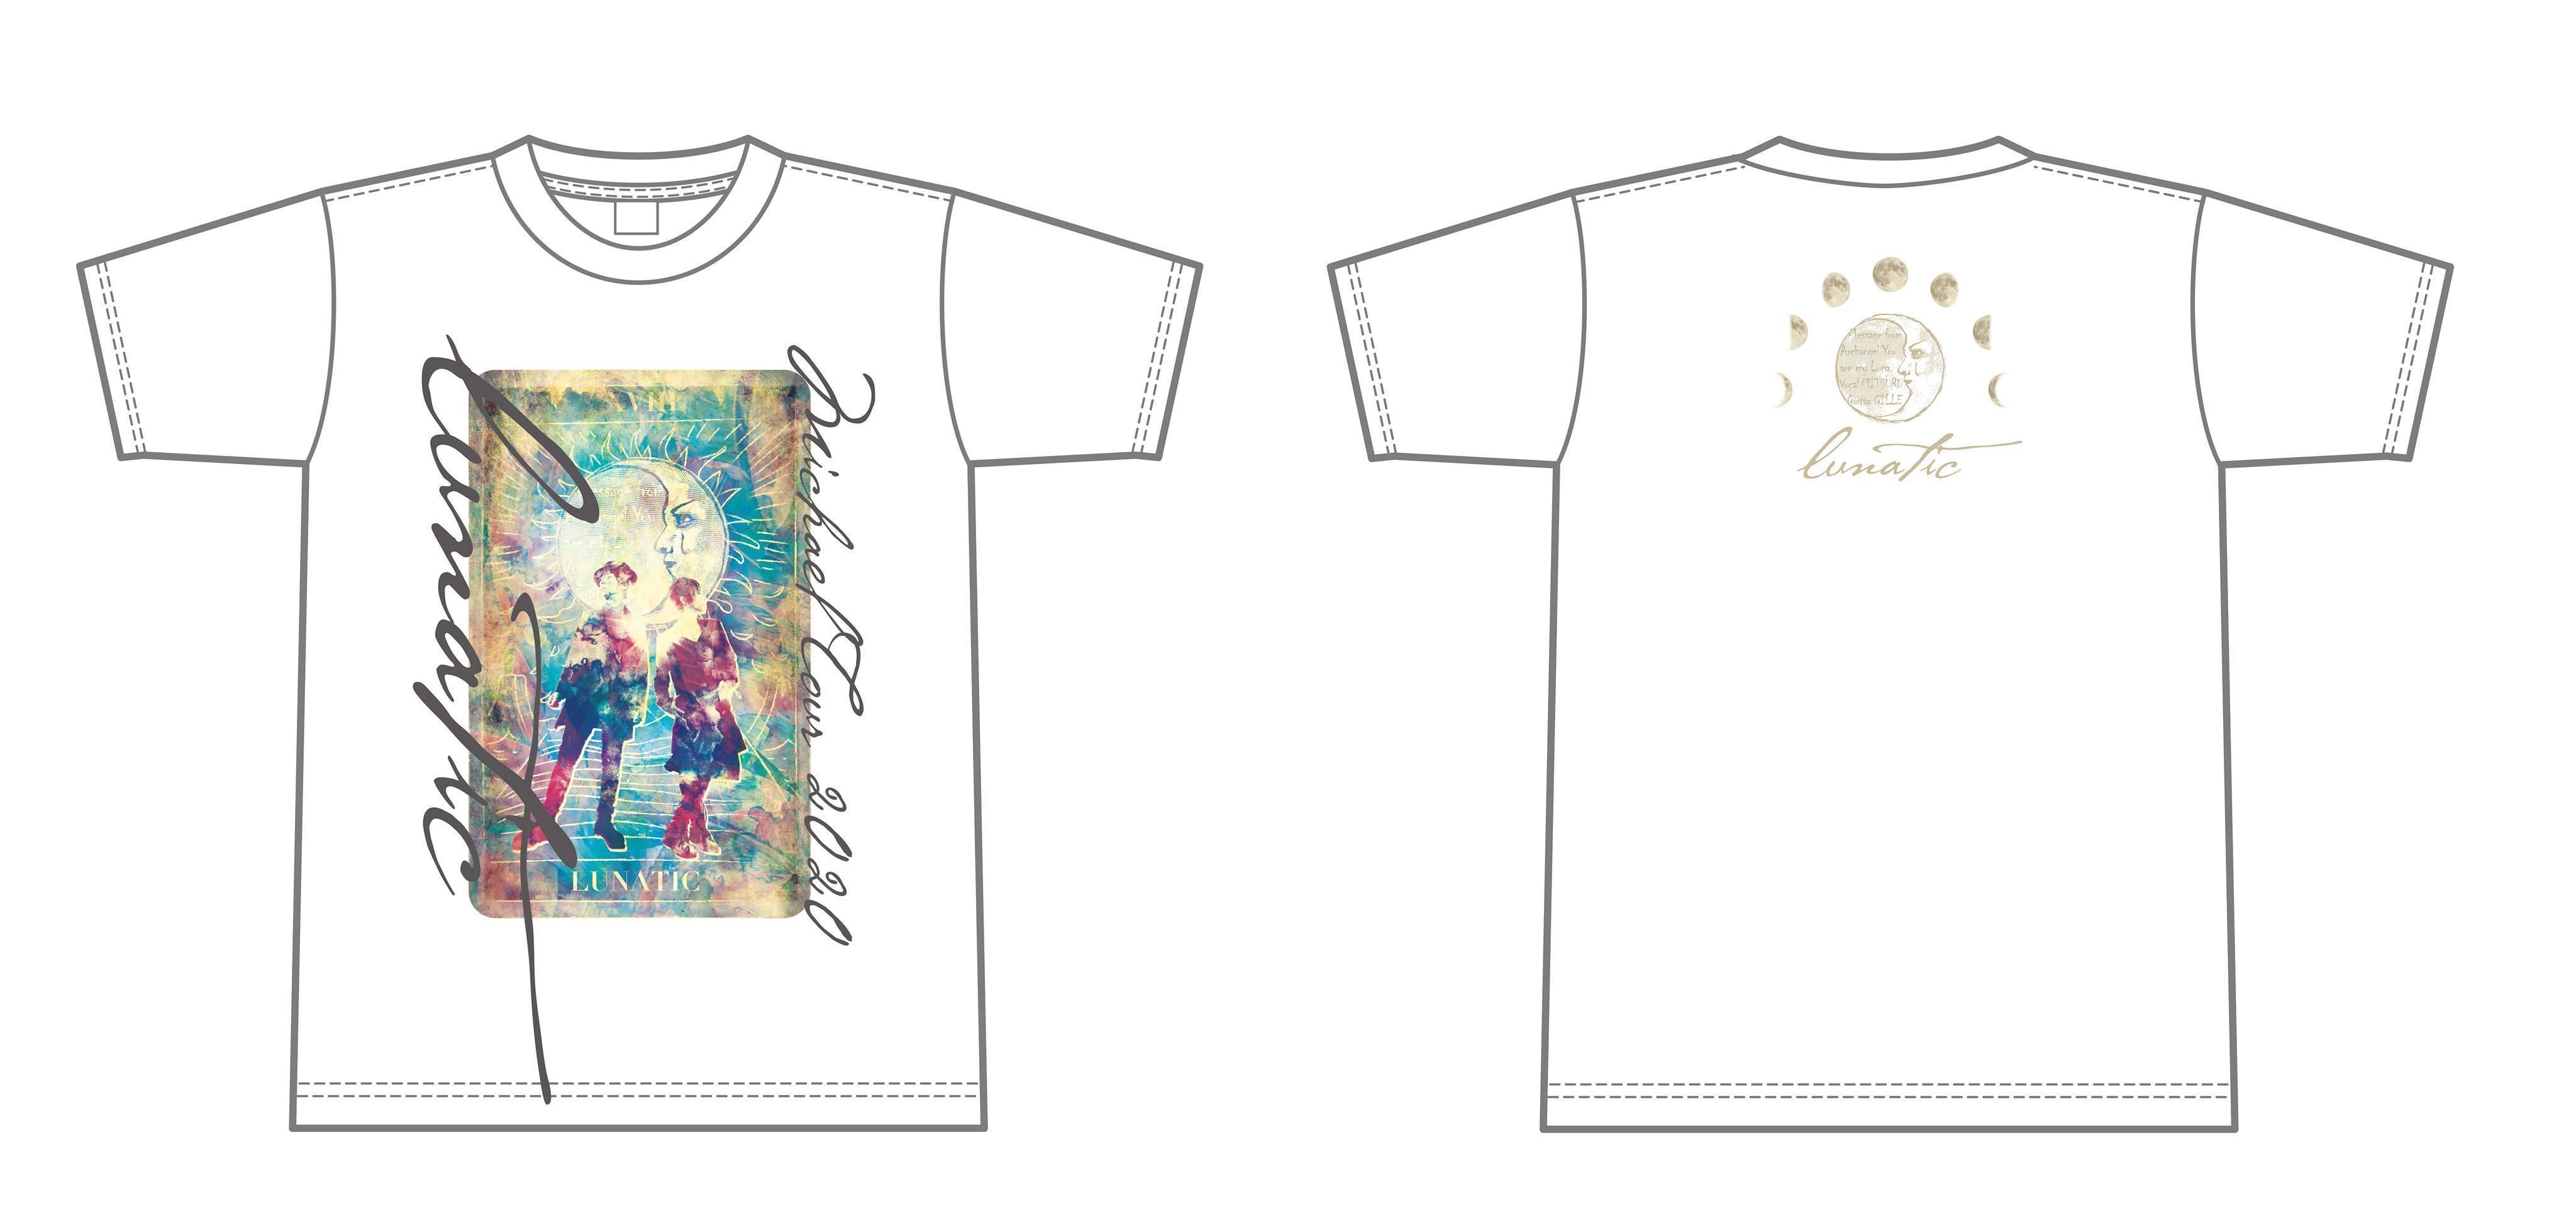 【MICHAEL TOUR 2020 Lunatic】松岡充プロデュース/コロナ対策セット/MICHAEL Blue ver.【二次発送】